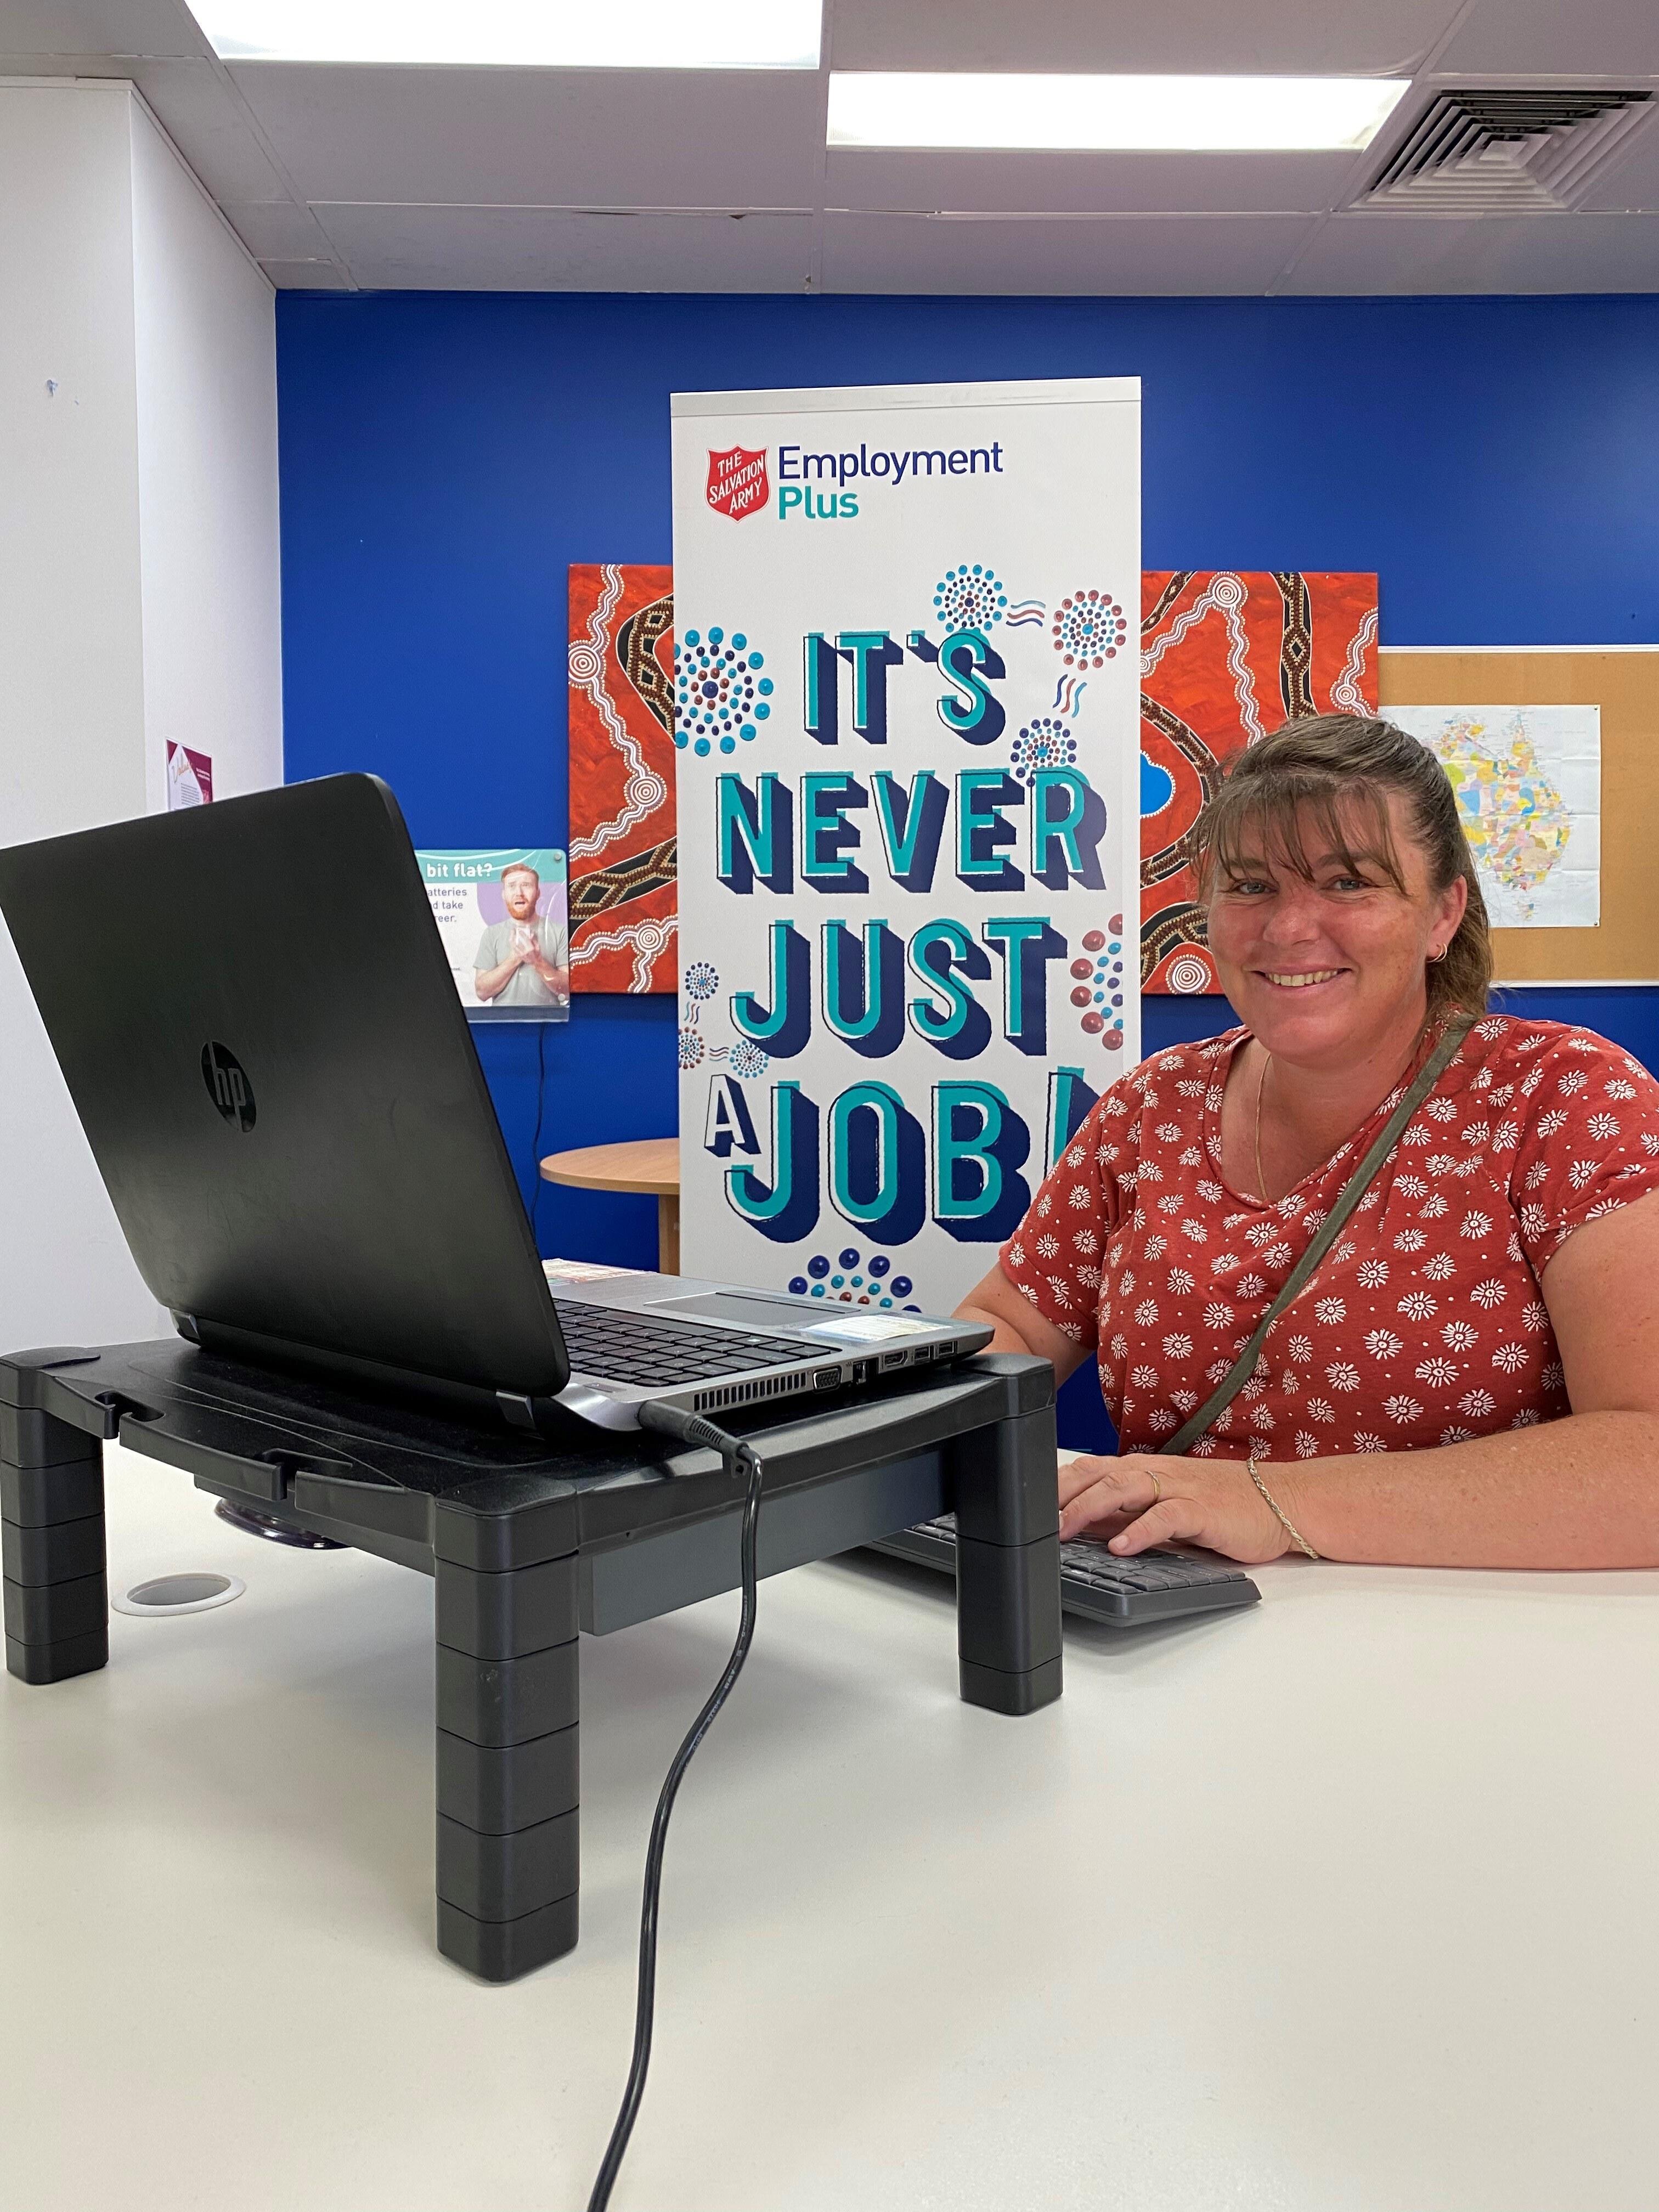 Digit-lit program comes online for Wivenhoe's mature job seekers